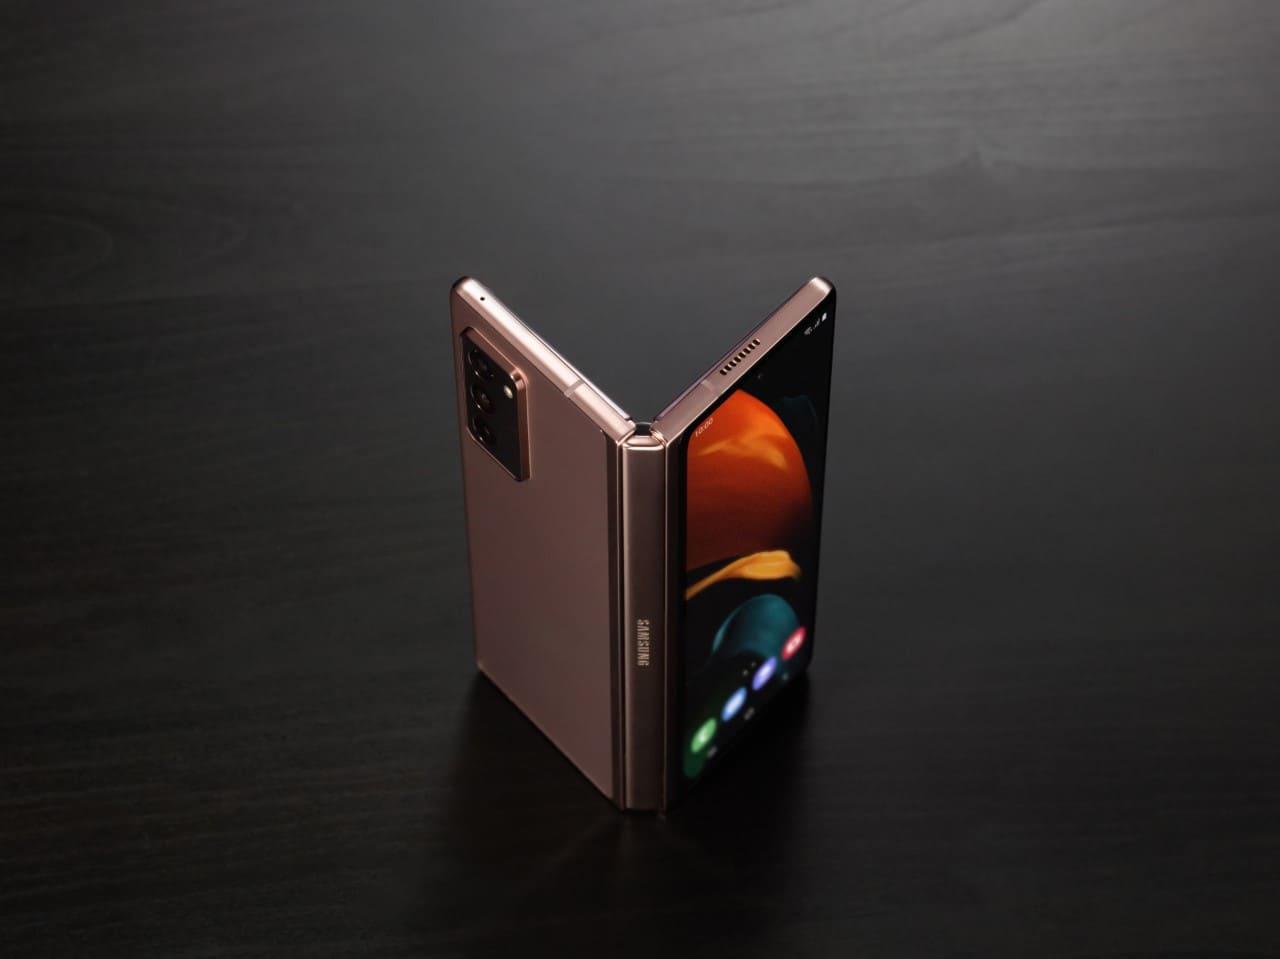 Samsung presentó su nuevo dispositivo plegable Galaxy Z Fold2